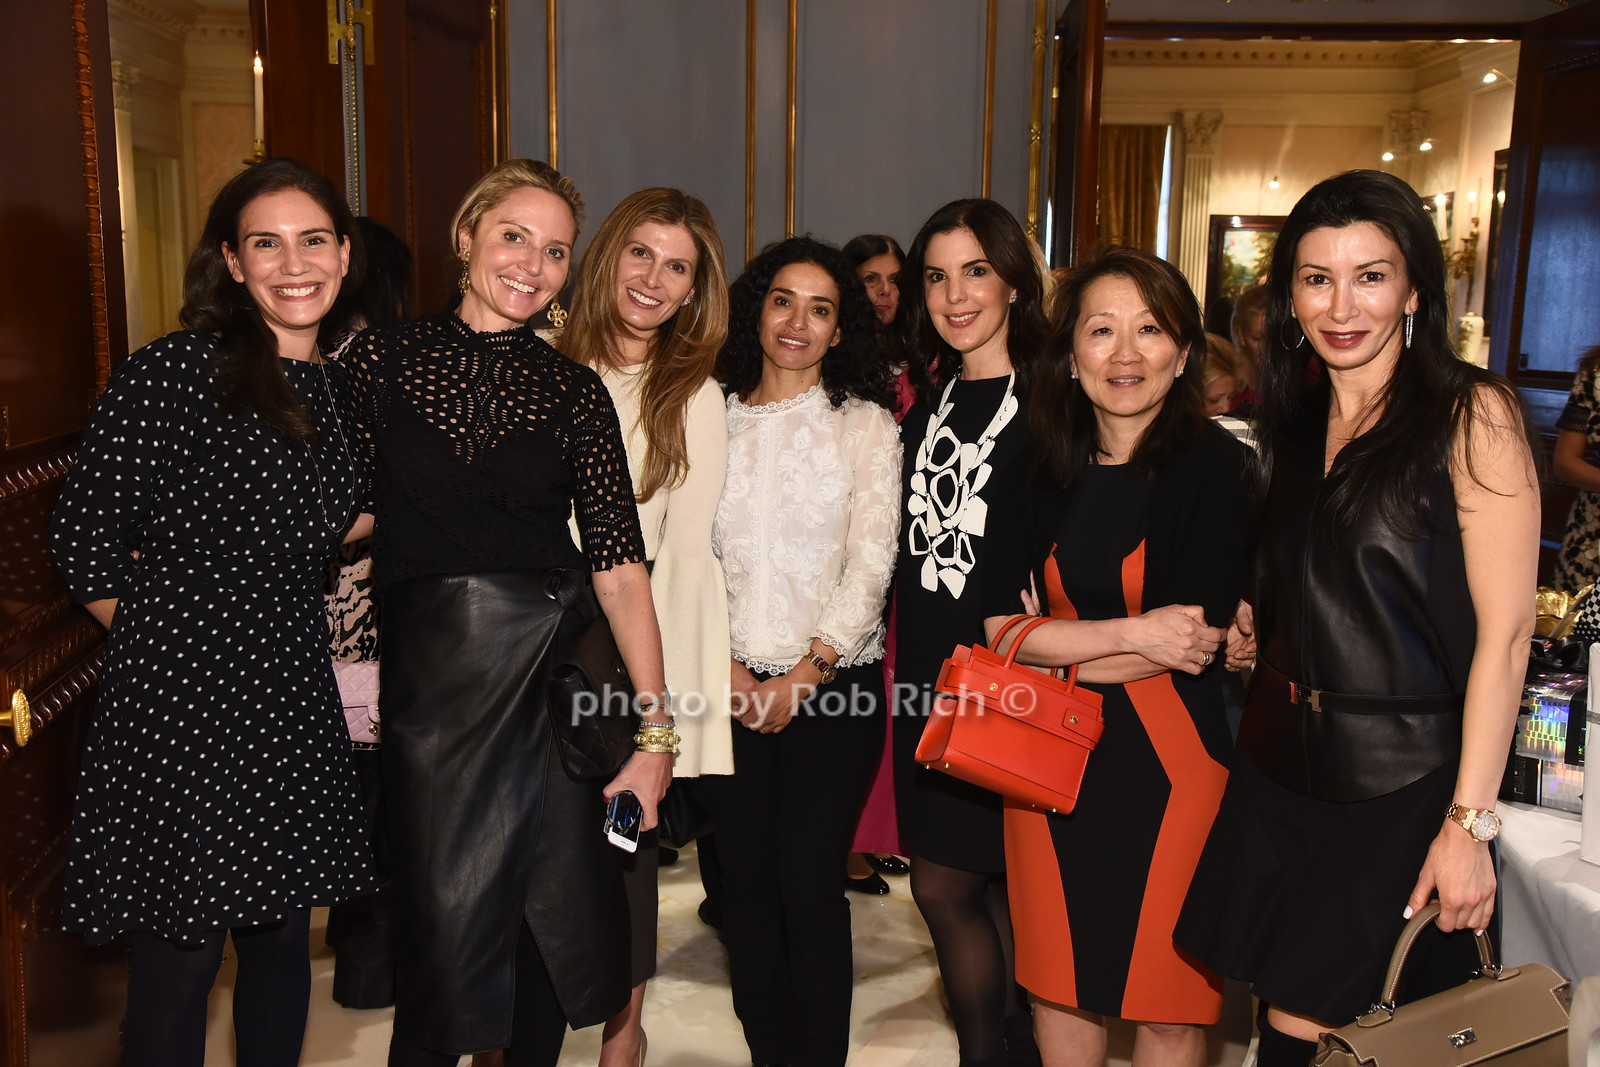 Michelle Goldwyn, Kim Heyman, Natasha Lelazarian,, Shevi  Peters, Shari Safra, Sandy Hoffen, Zina Rosen  photo  by Rob Rich/SocietyAllure.com ©2017 robrich101@gmail.com 516-676-3939